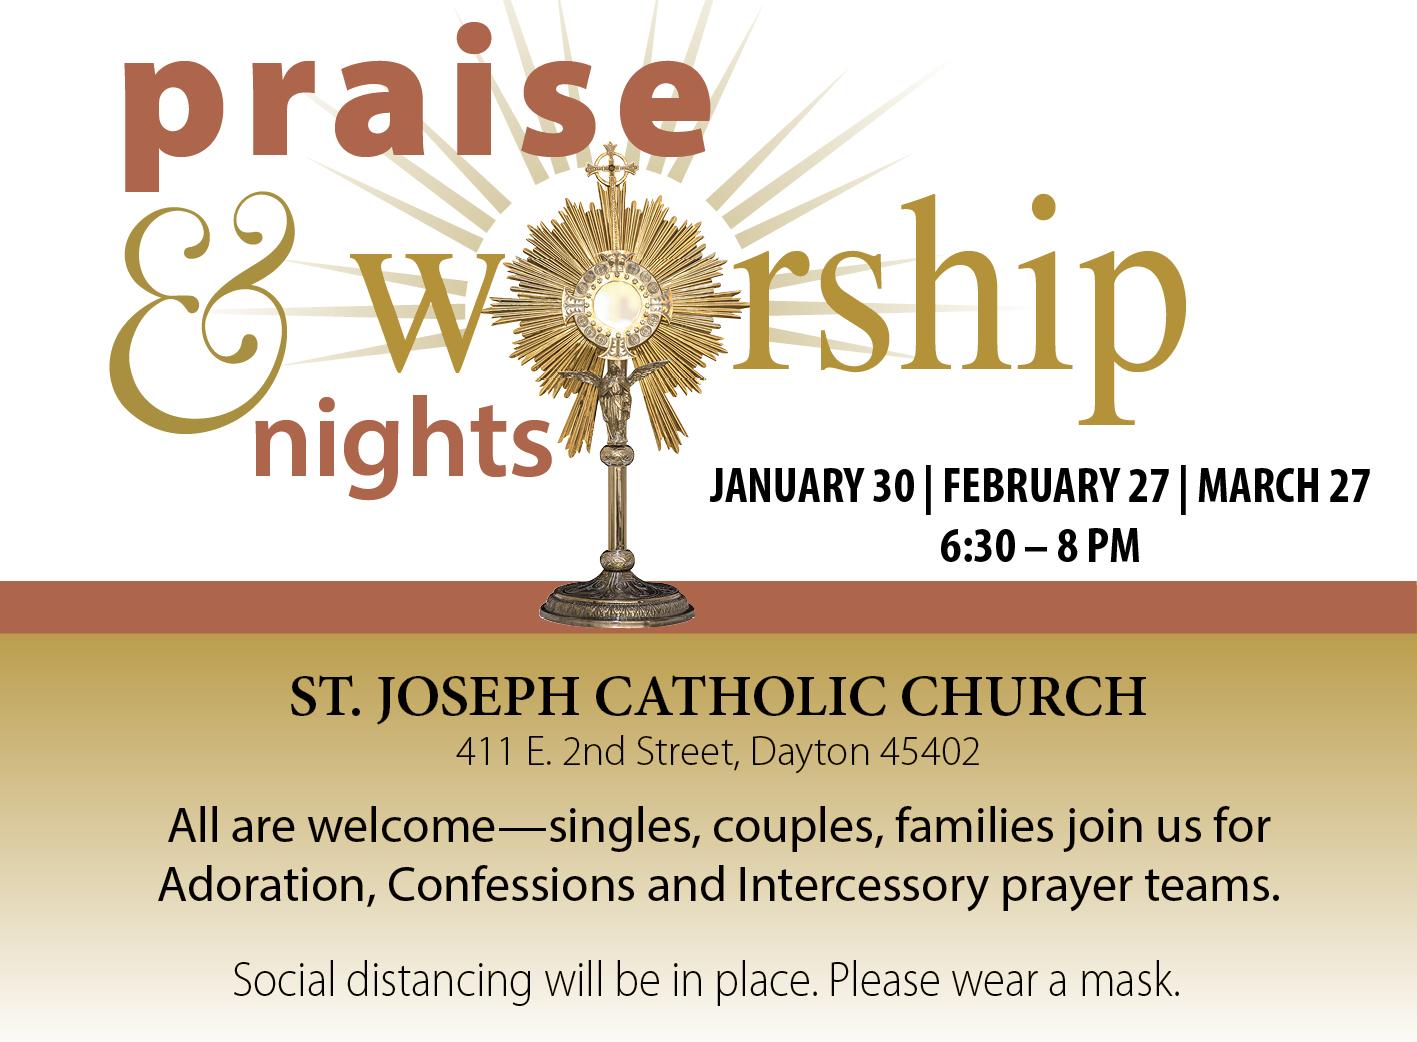 Praise-and-Worship-nights-2021